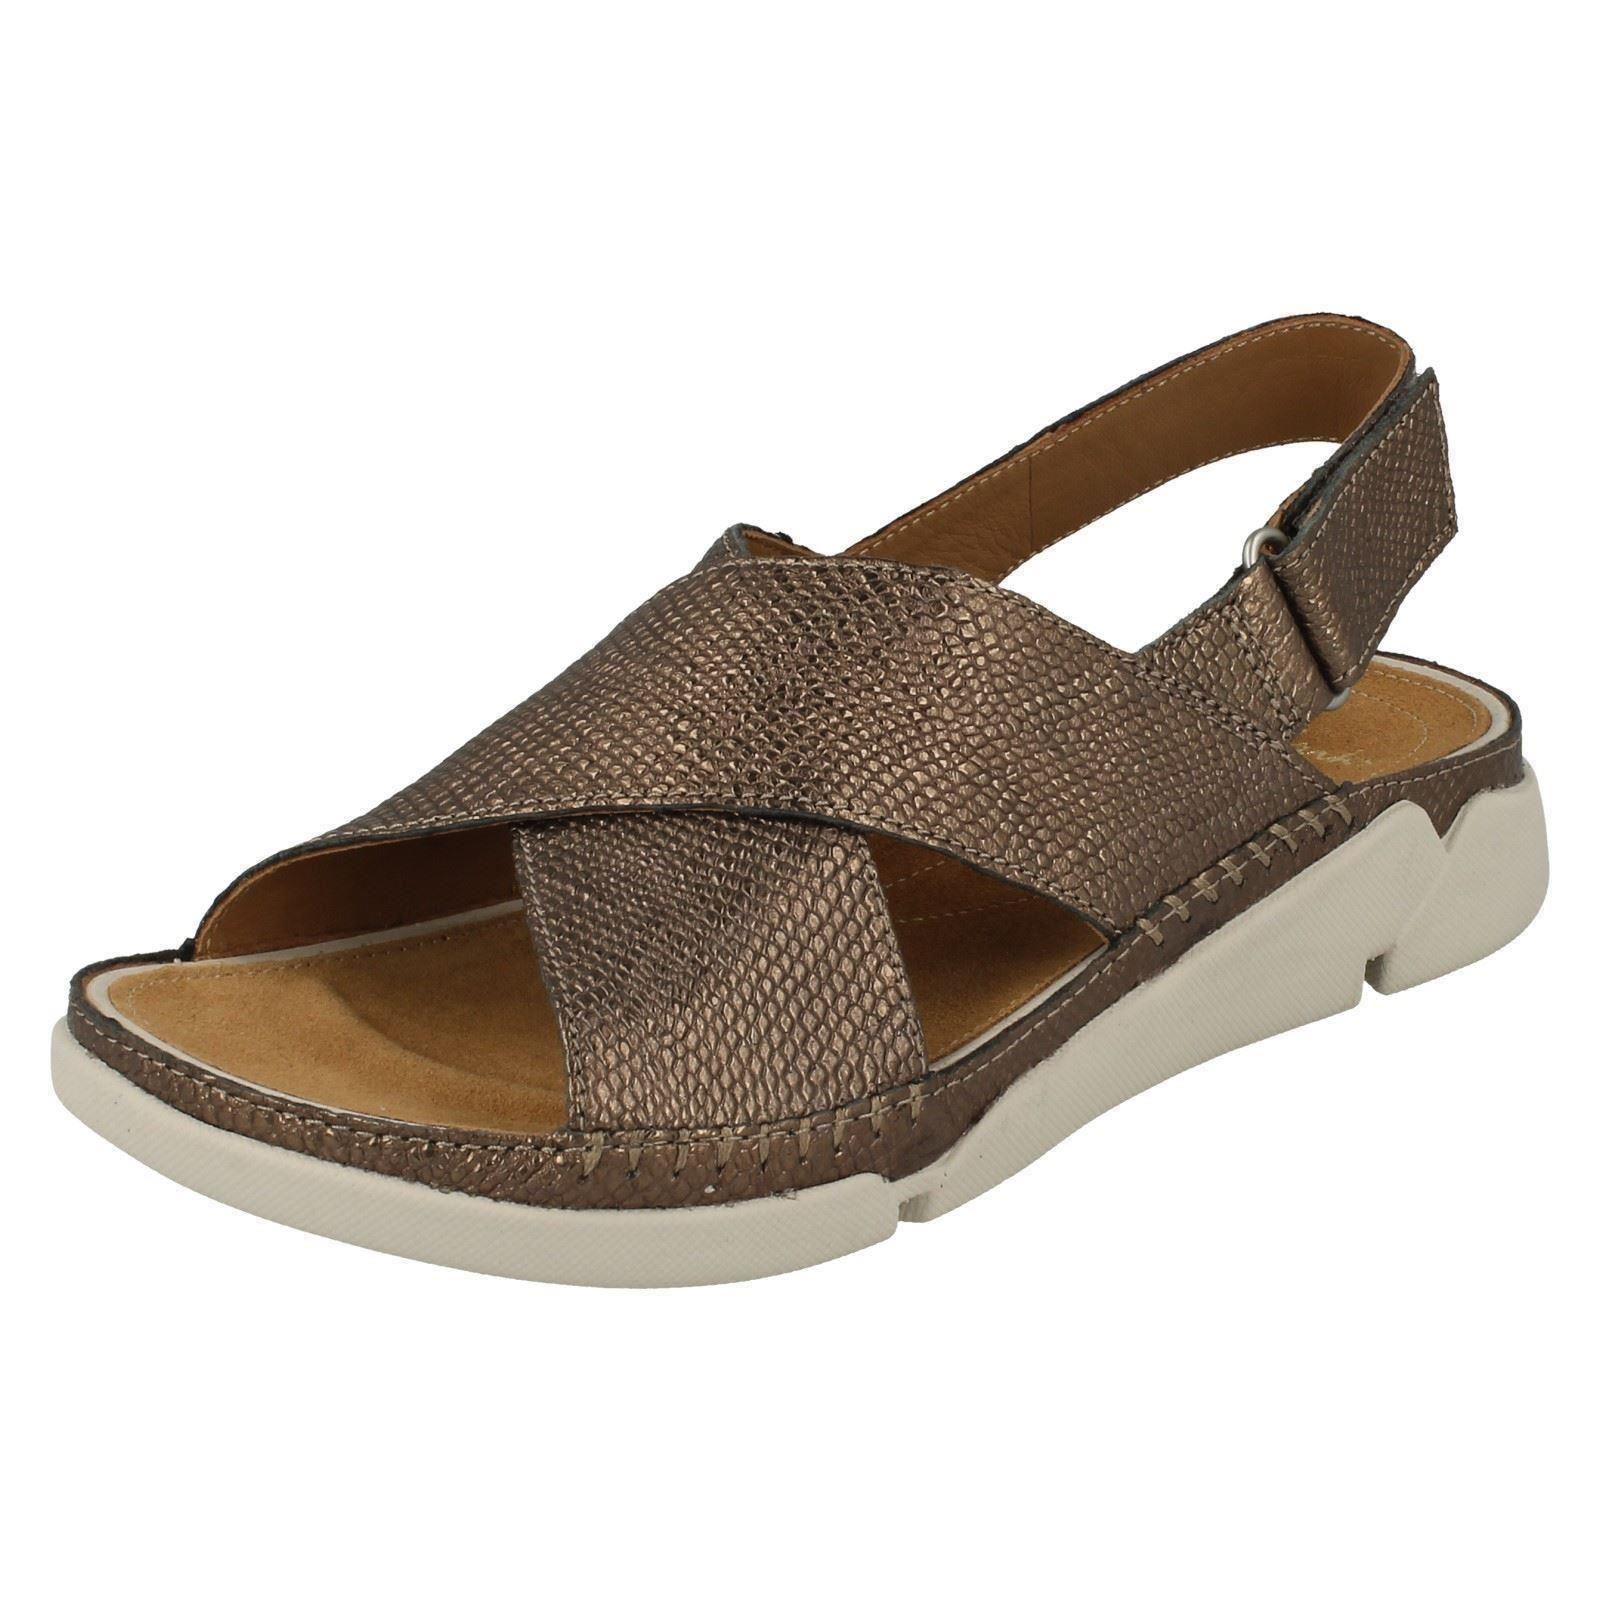 clarks open toe casual sandals label tri alexia